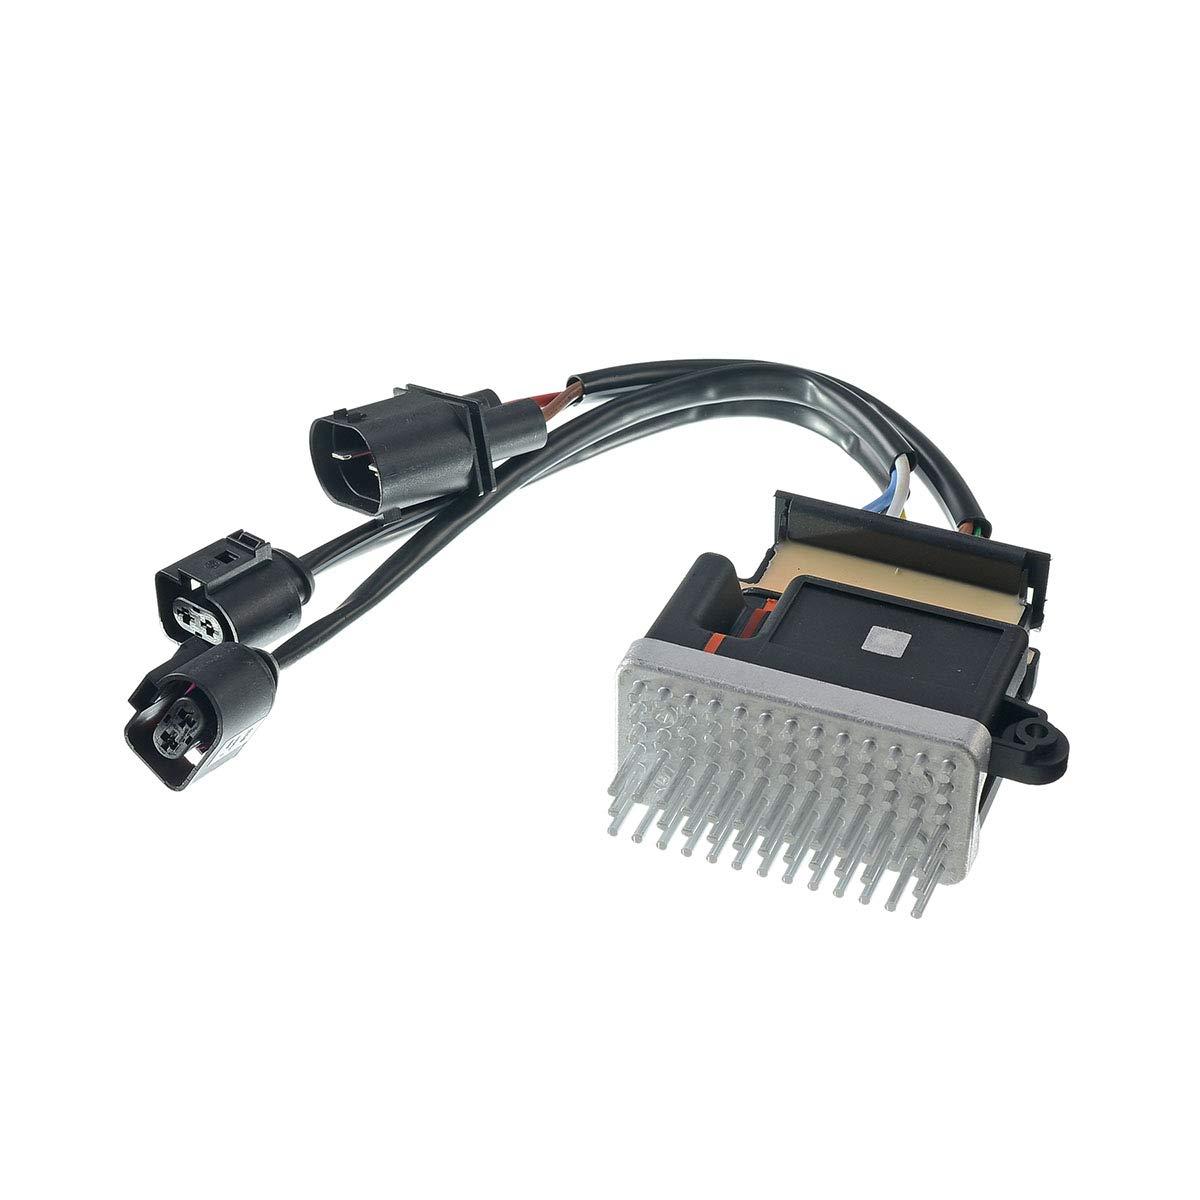 A-Premium Engine Cooling Fan Control Module for Audi A4 A5 A6 A7 Quattro Q3 Q5